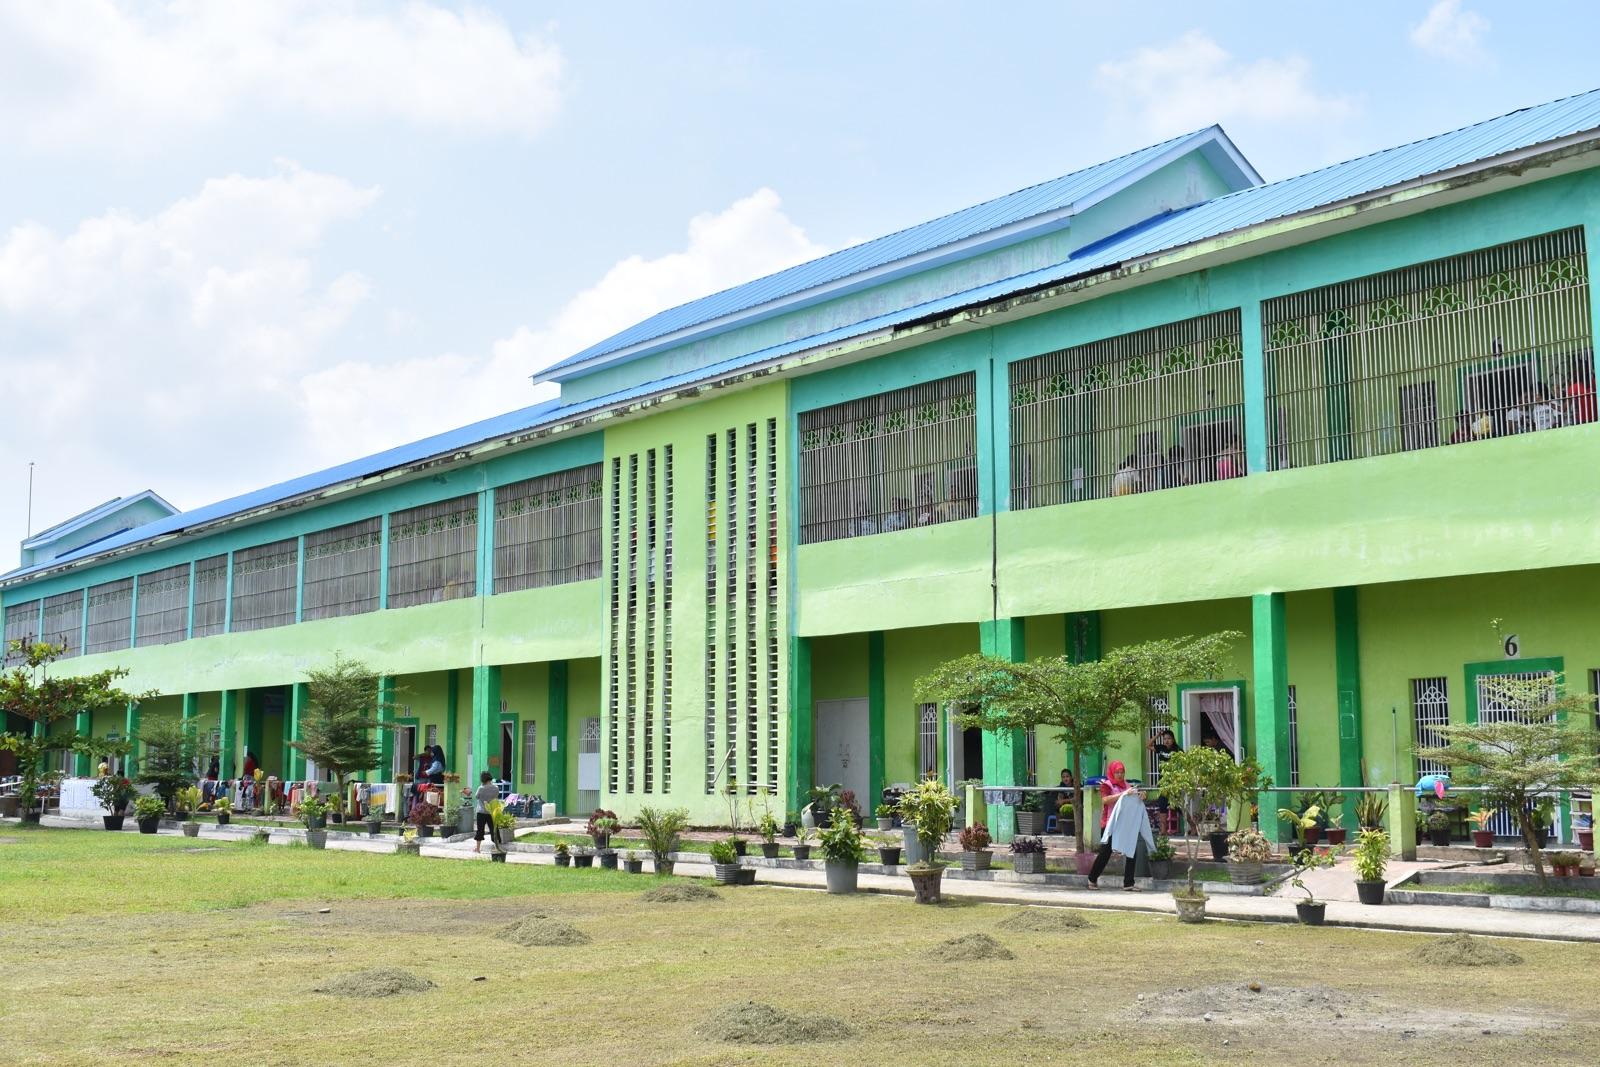 Tanjung Gusta Women's Prison - New Naratif